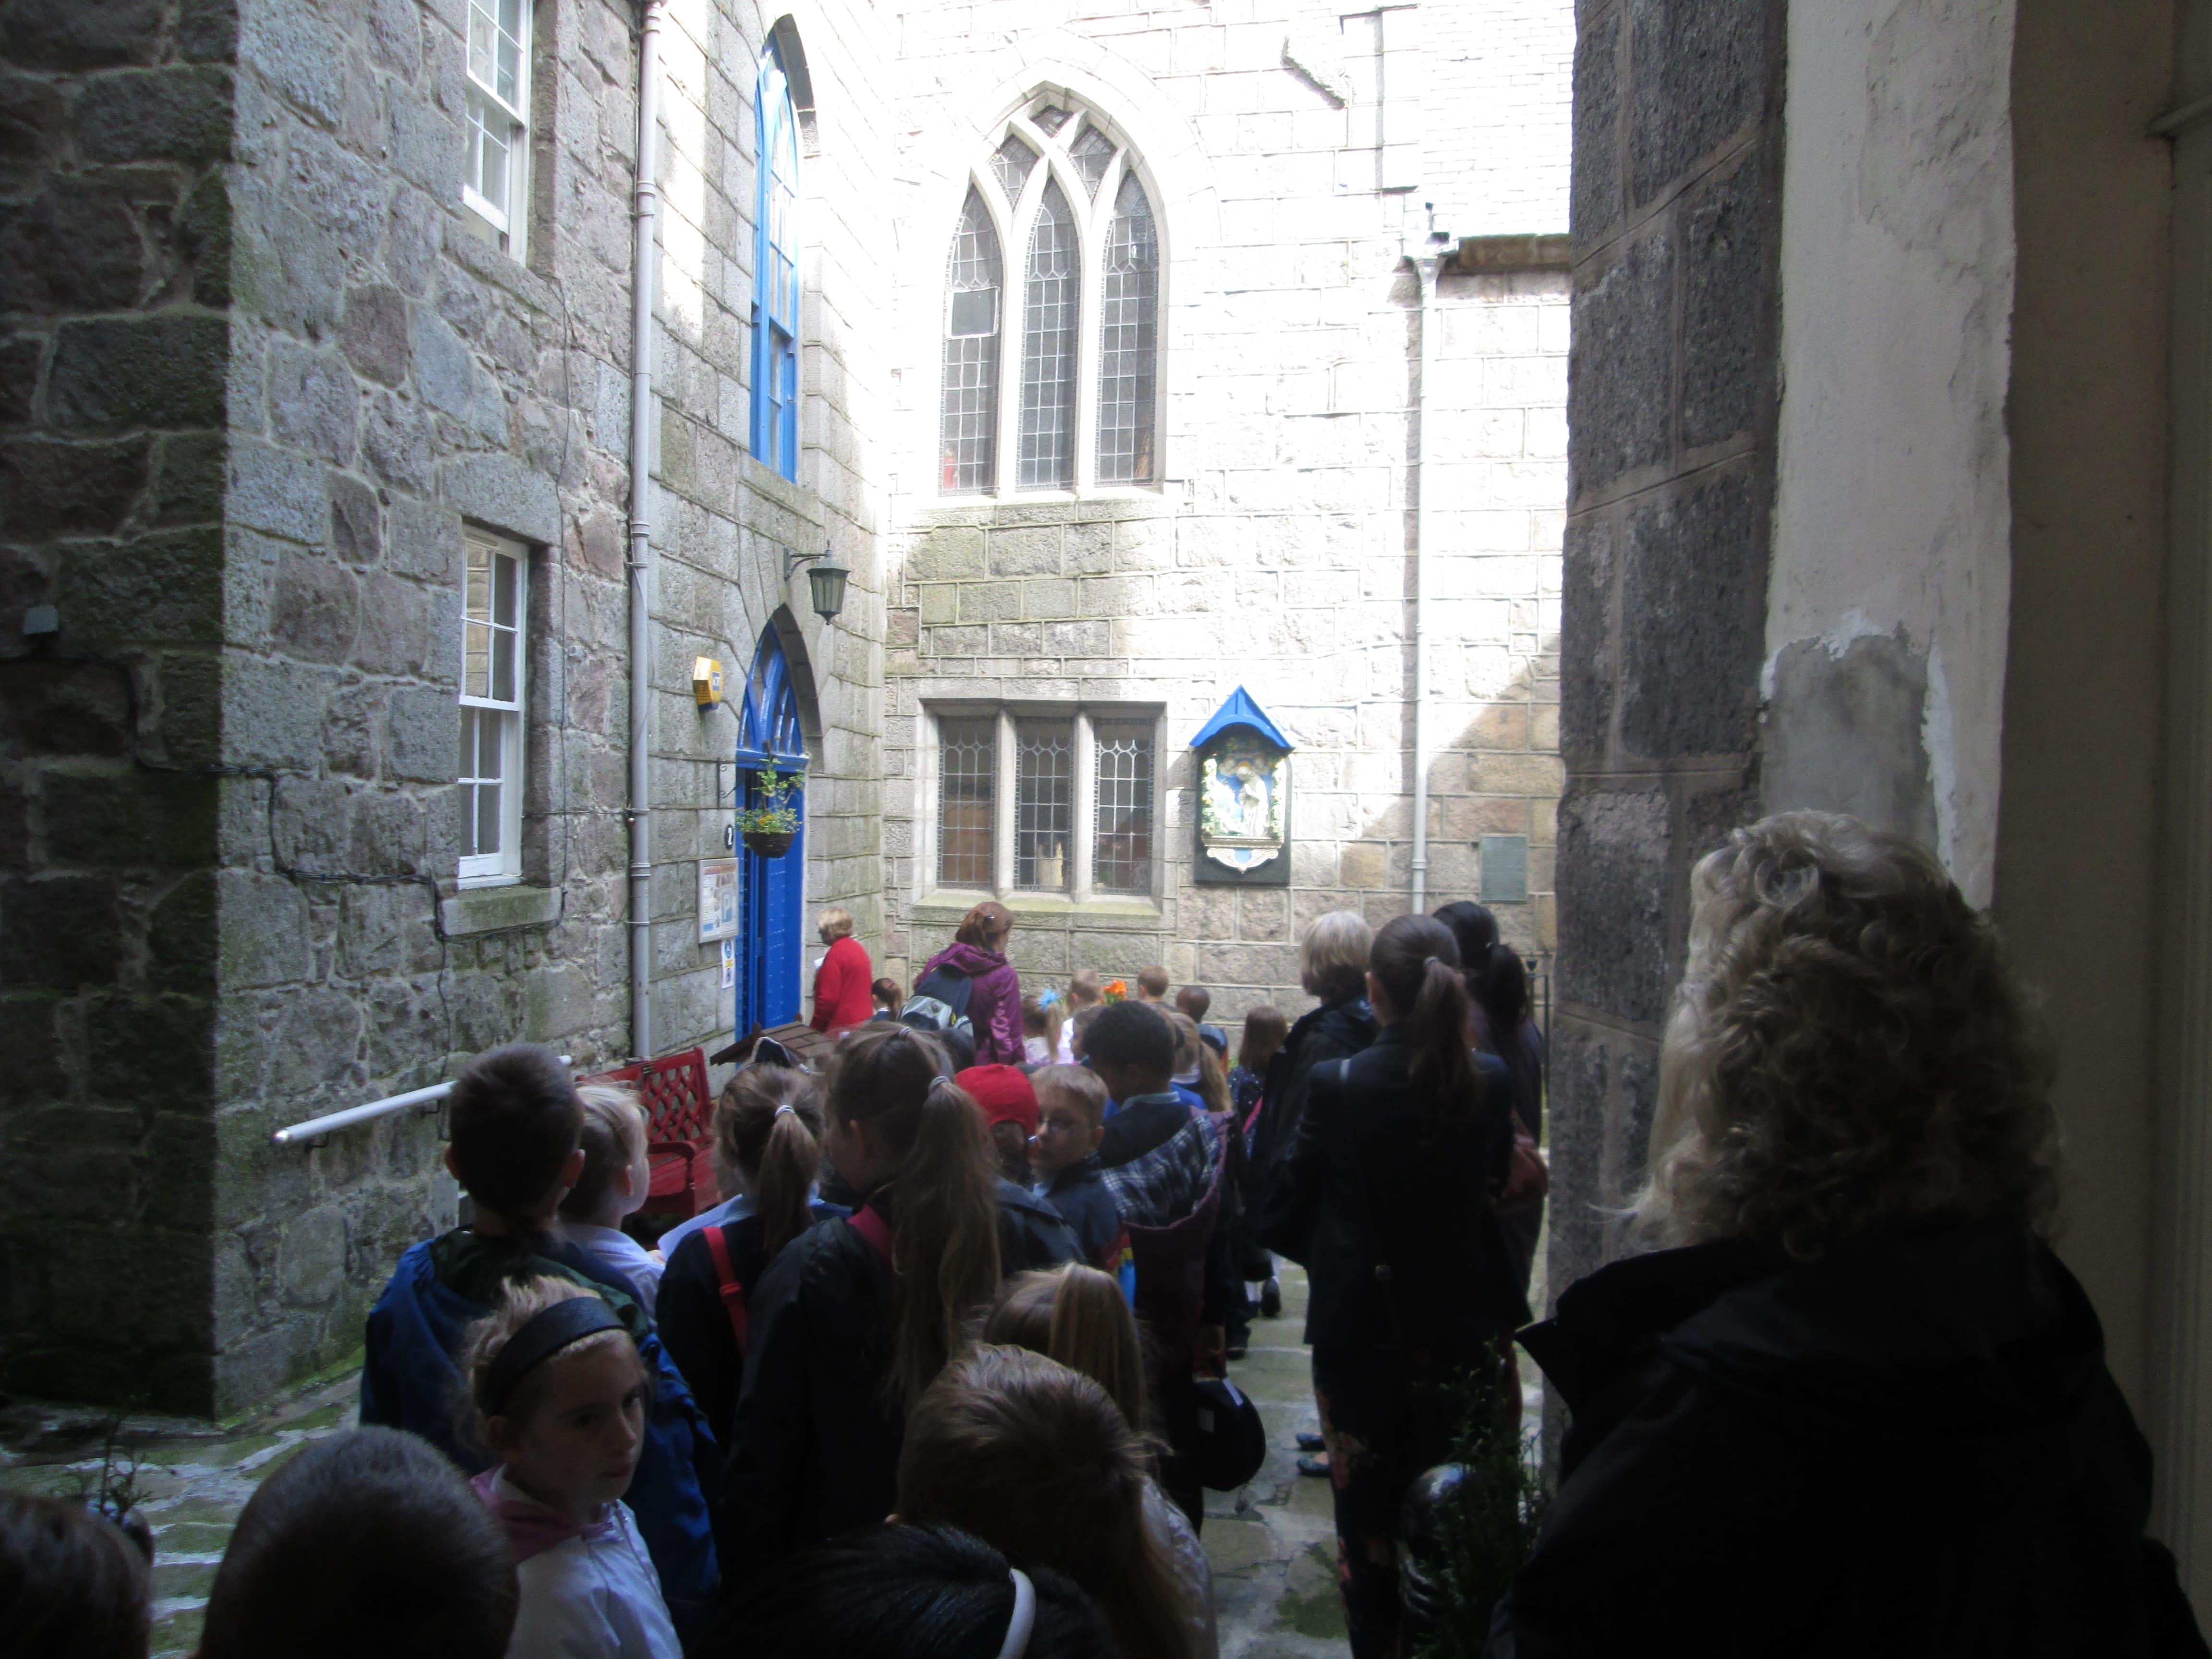 P3 Sacrament of Reconciliation and Maritime Museum